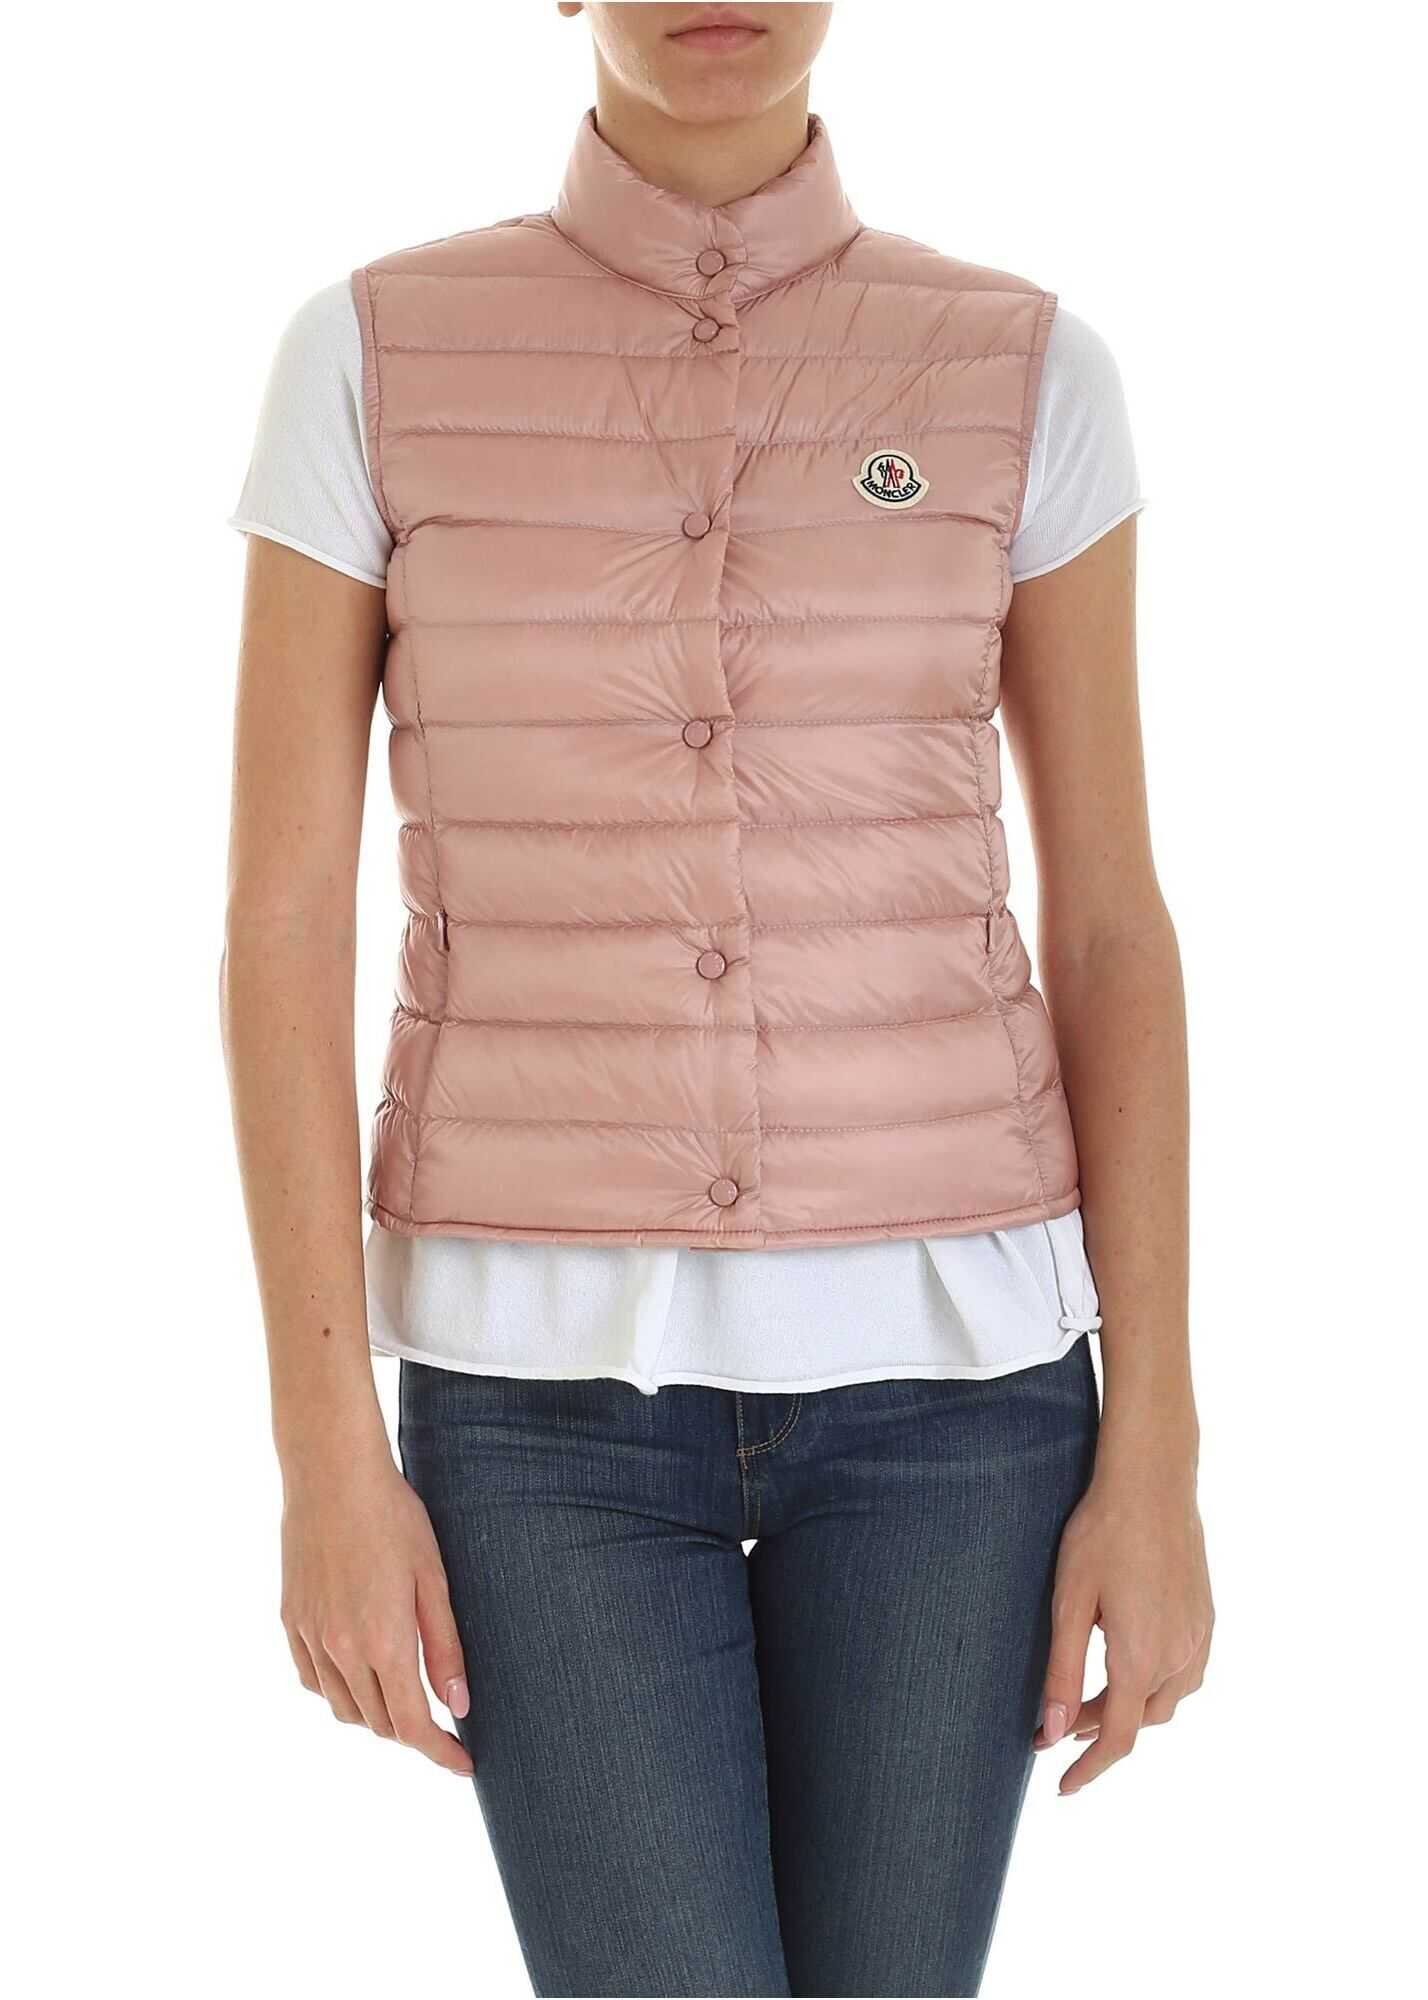 Liane Waistcoat In Pink thumbnail